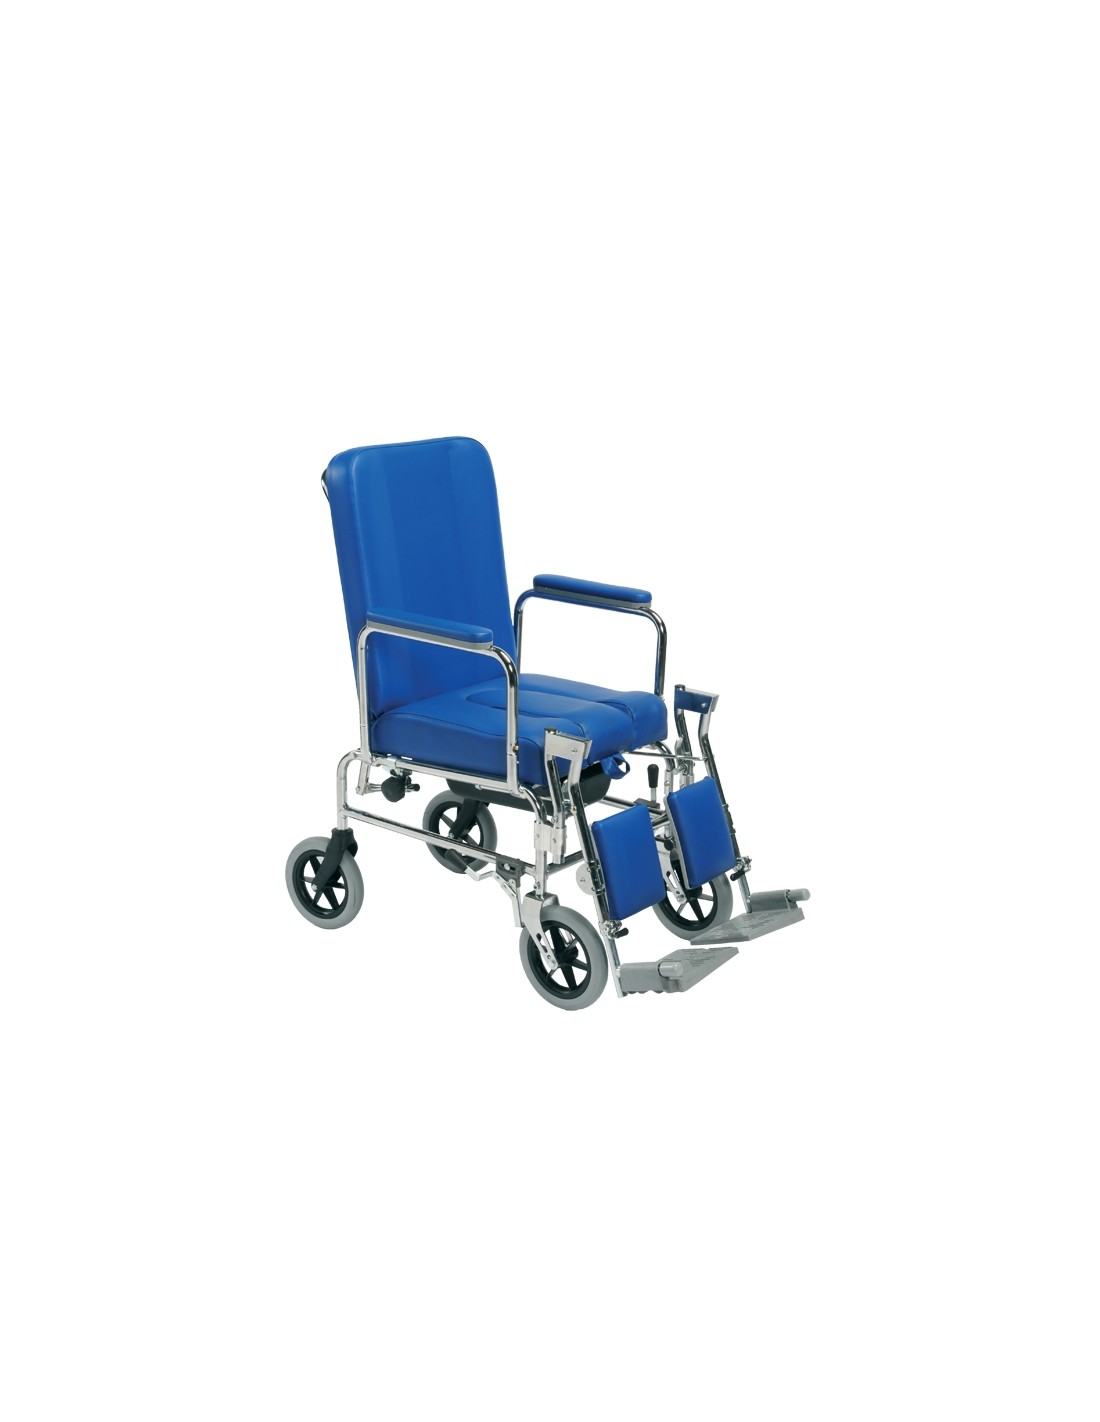 sedie a rotelle imbottite con e senza wc - sanitaria e ortopedia